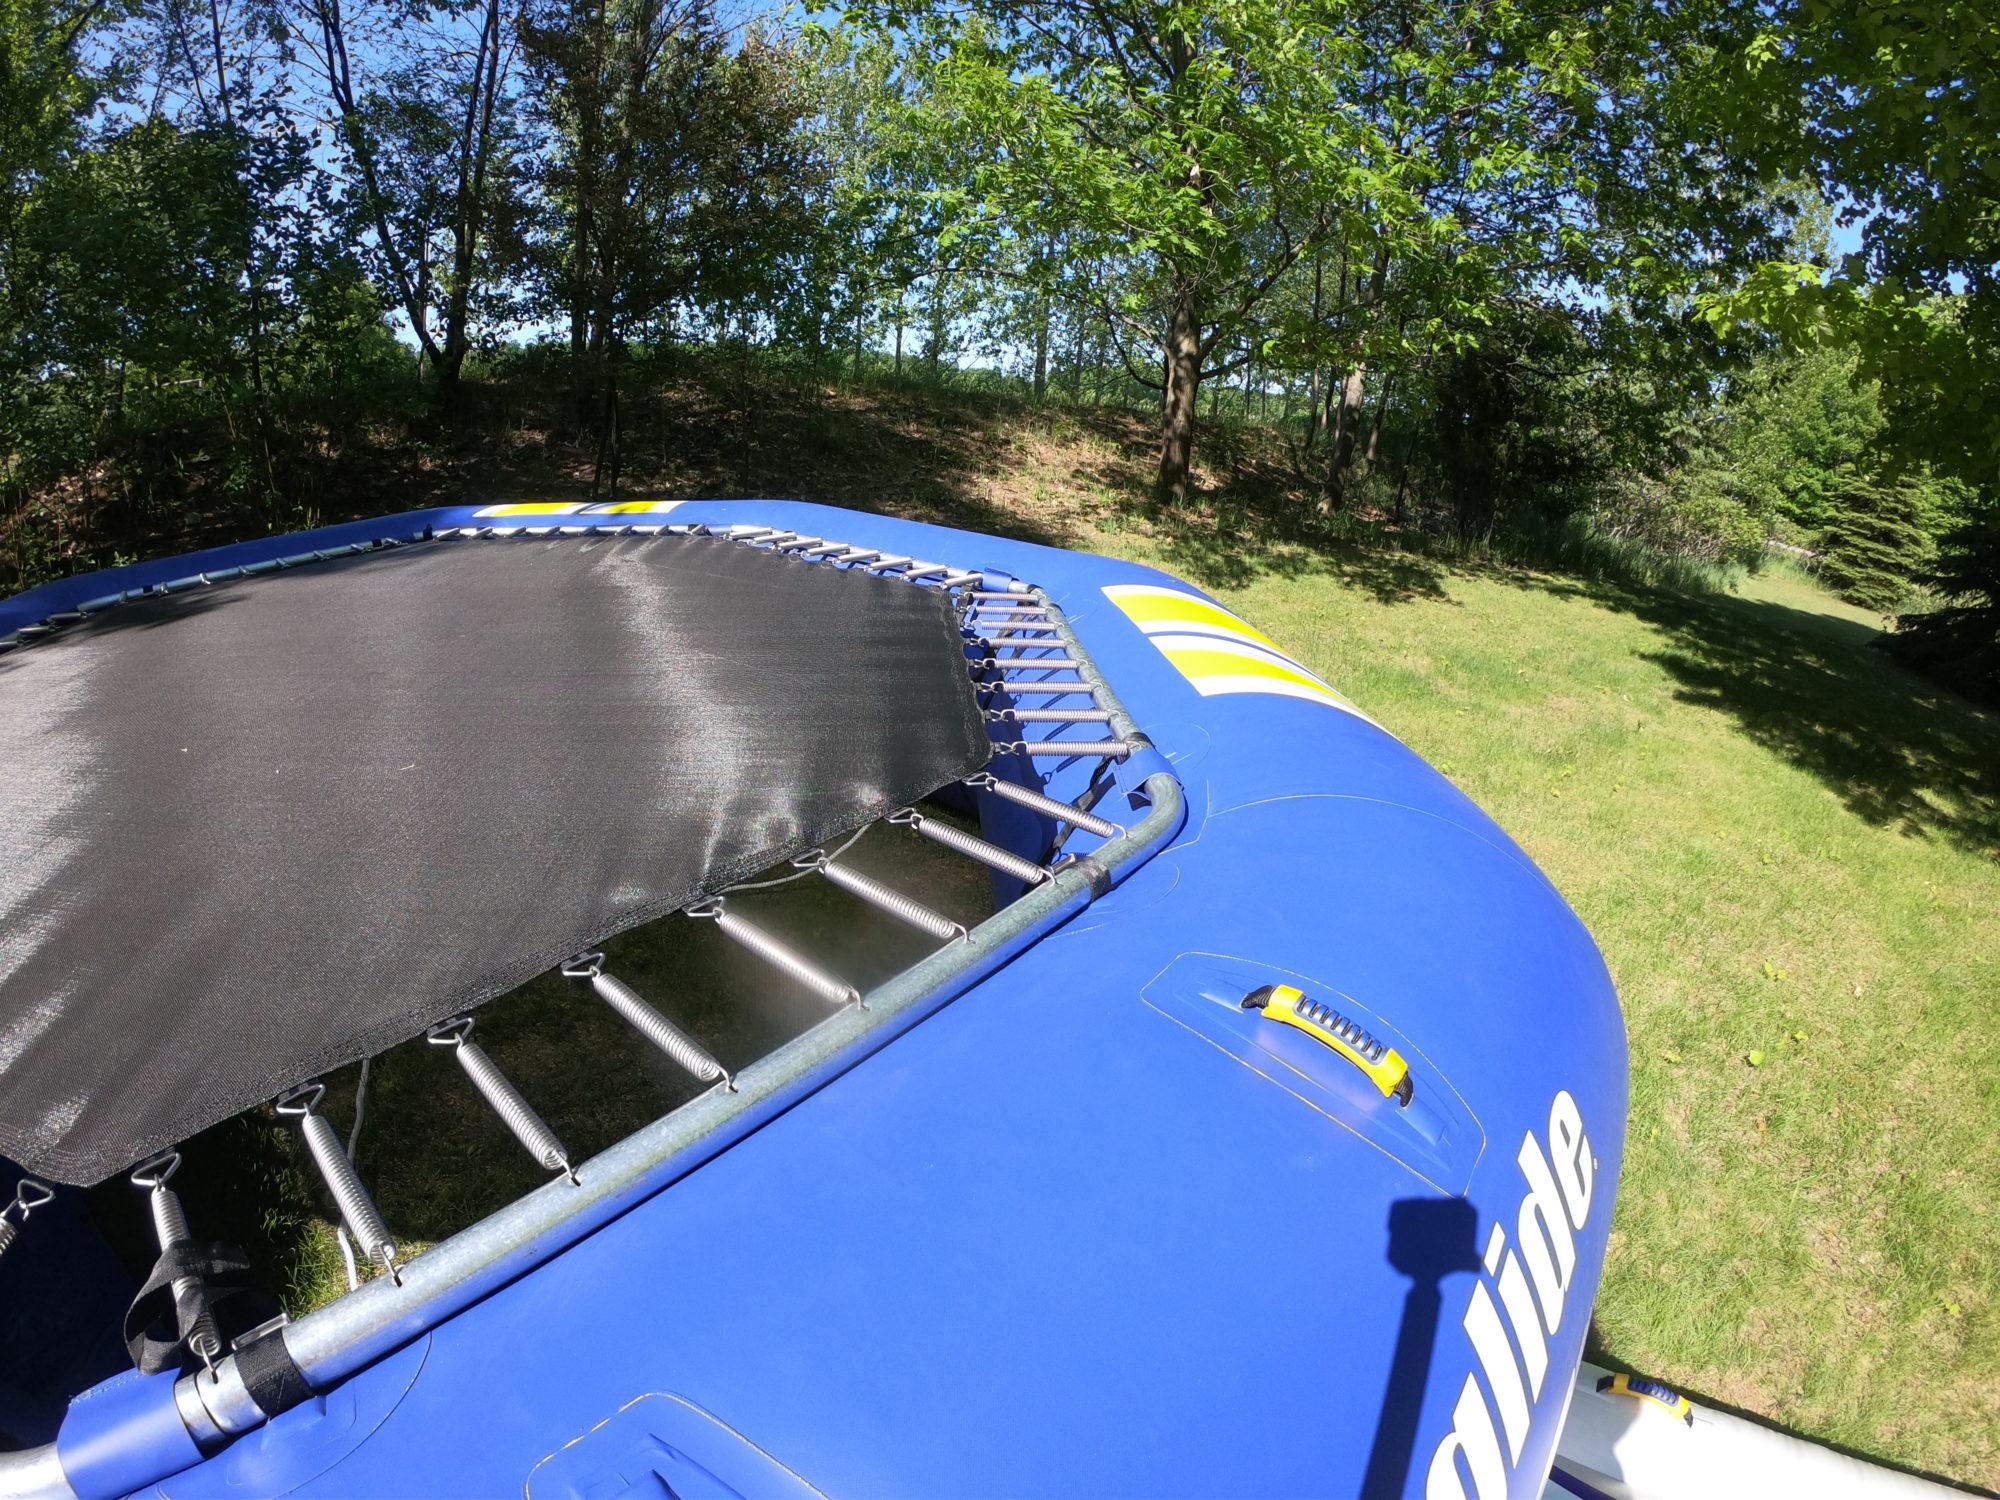 A playnorth water trampoline rental being set up in leelanau county